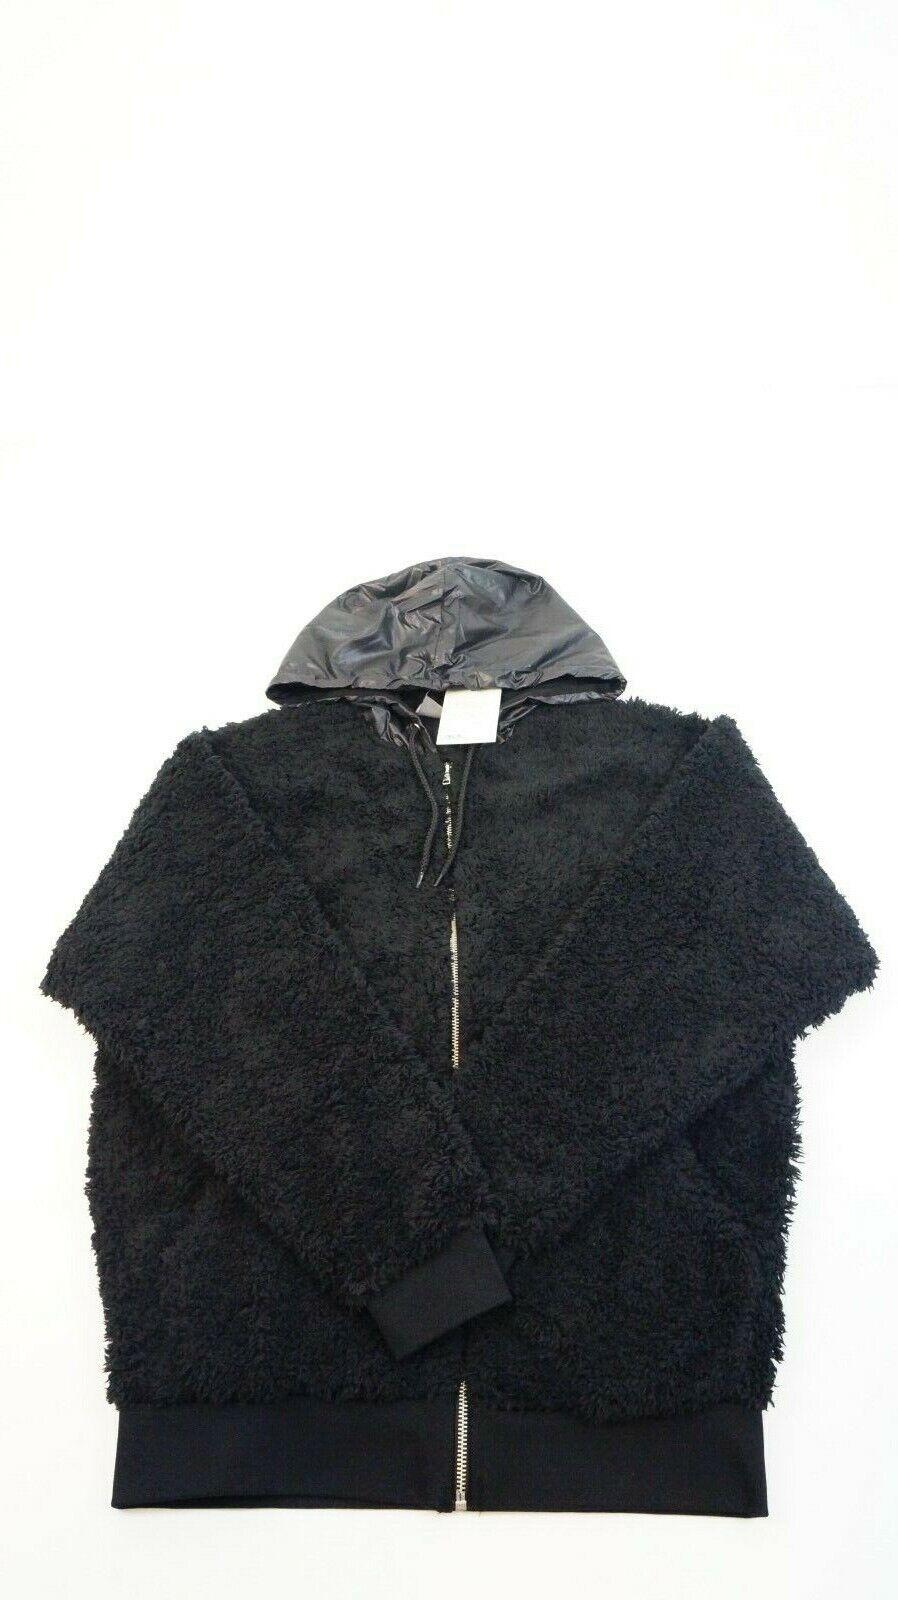 Asos Oversized Borg Zip Hoodie Damen Kapuzen Pullover schwarz Gr. XS NEU #K437